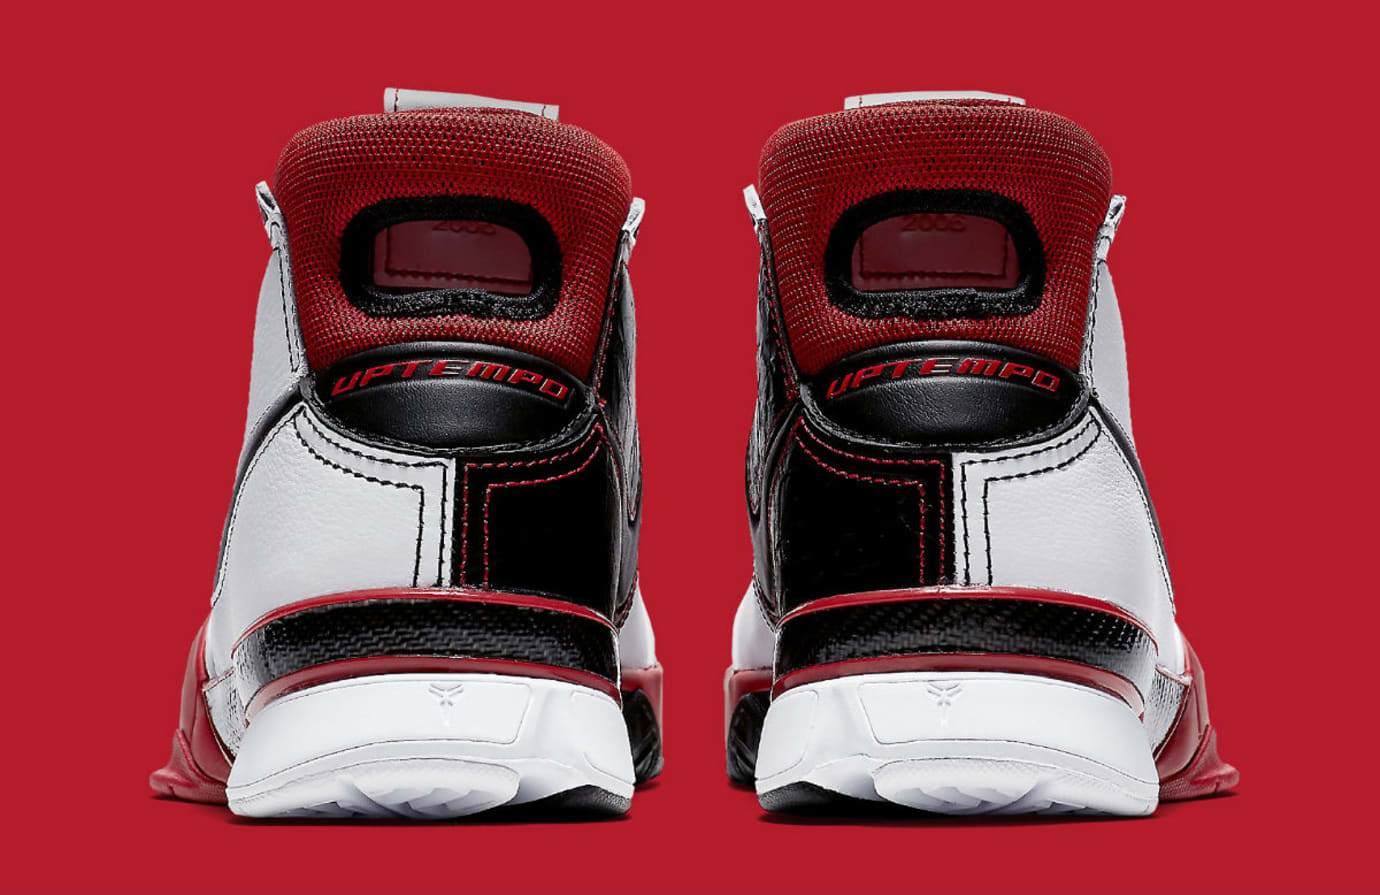 Nike Zoom Kobe 1 Protro All-Star Release Date AQ2728-102 Heel